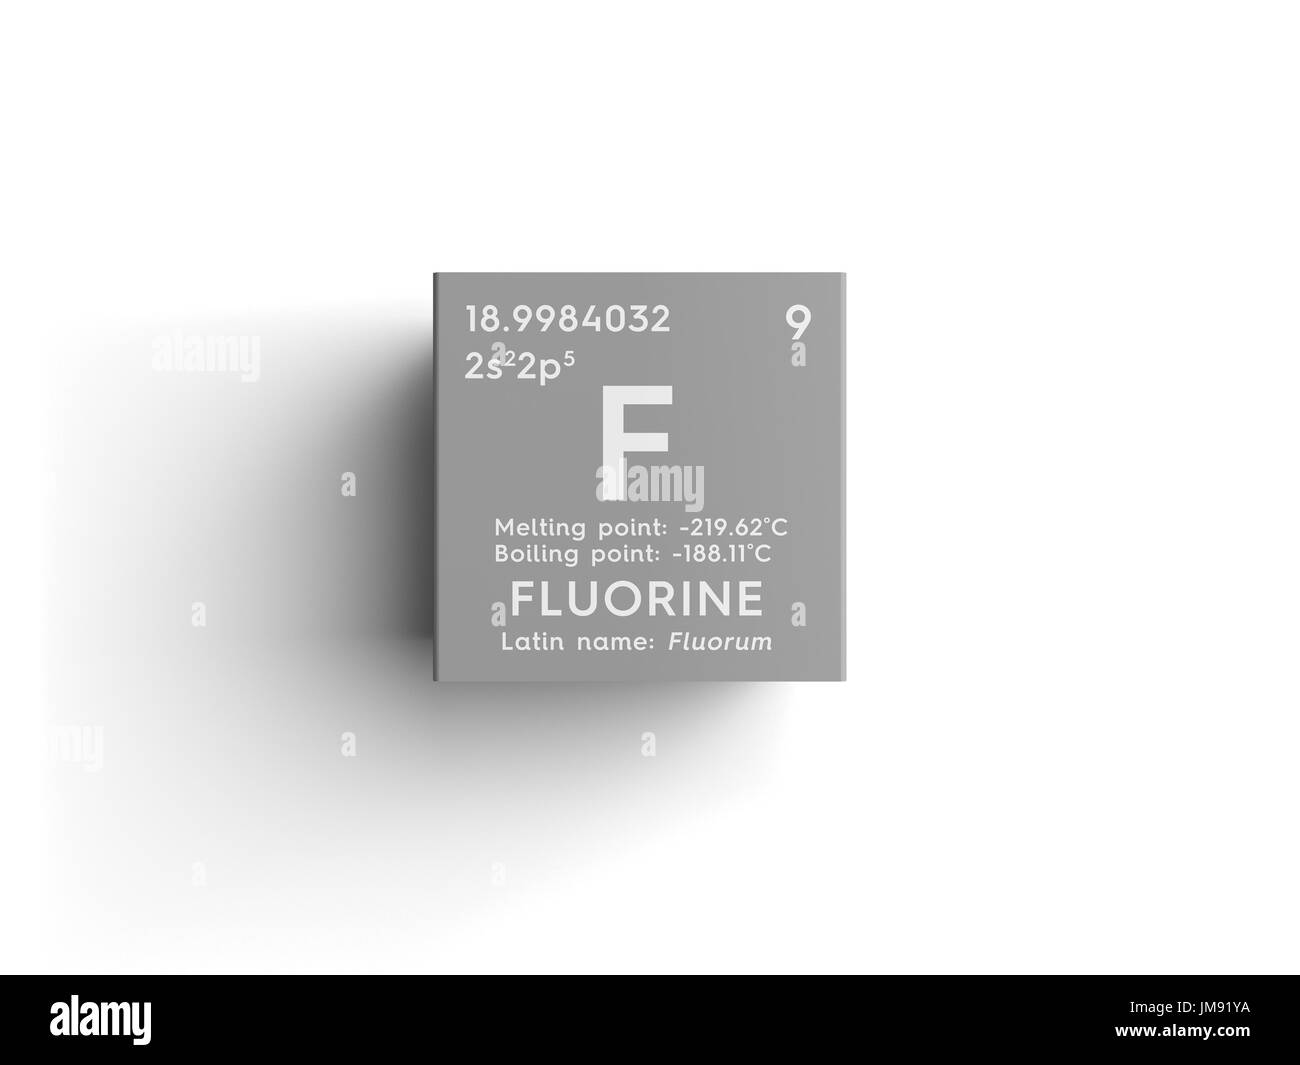 Fluorine halogens chemical element of mendeleevs periodic table chemical element of mendeleevs periodic table stock photo 150175182 alamy urtaz Gallery